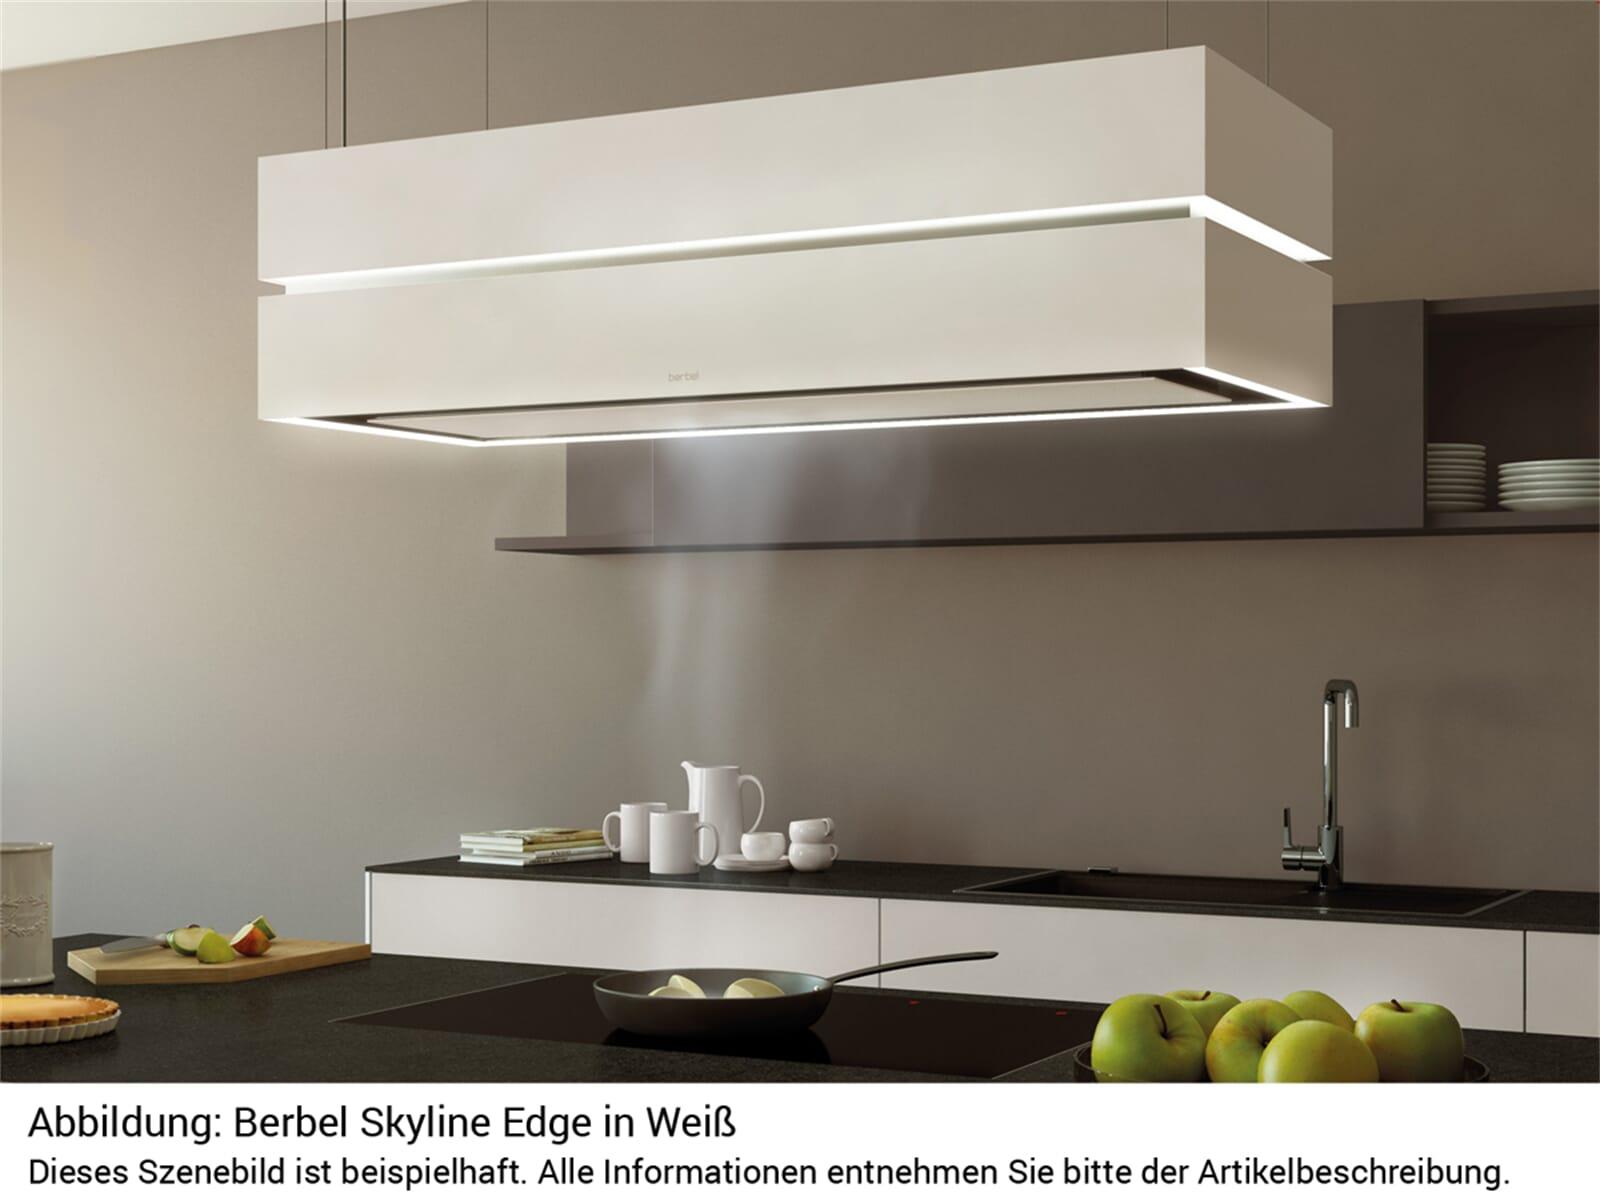 Berbel Skyline Edge BDL 95 SKE Deckenlifthaube Weiß